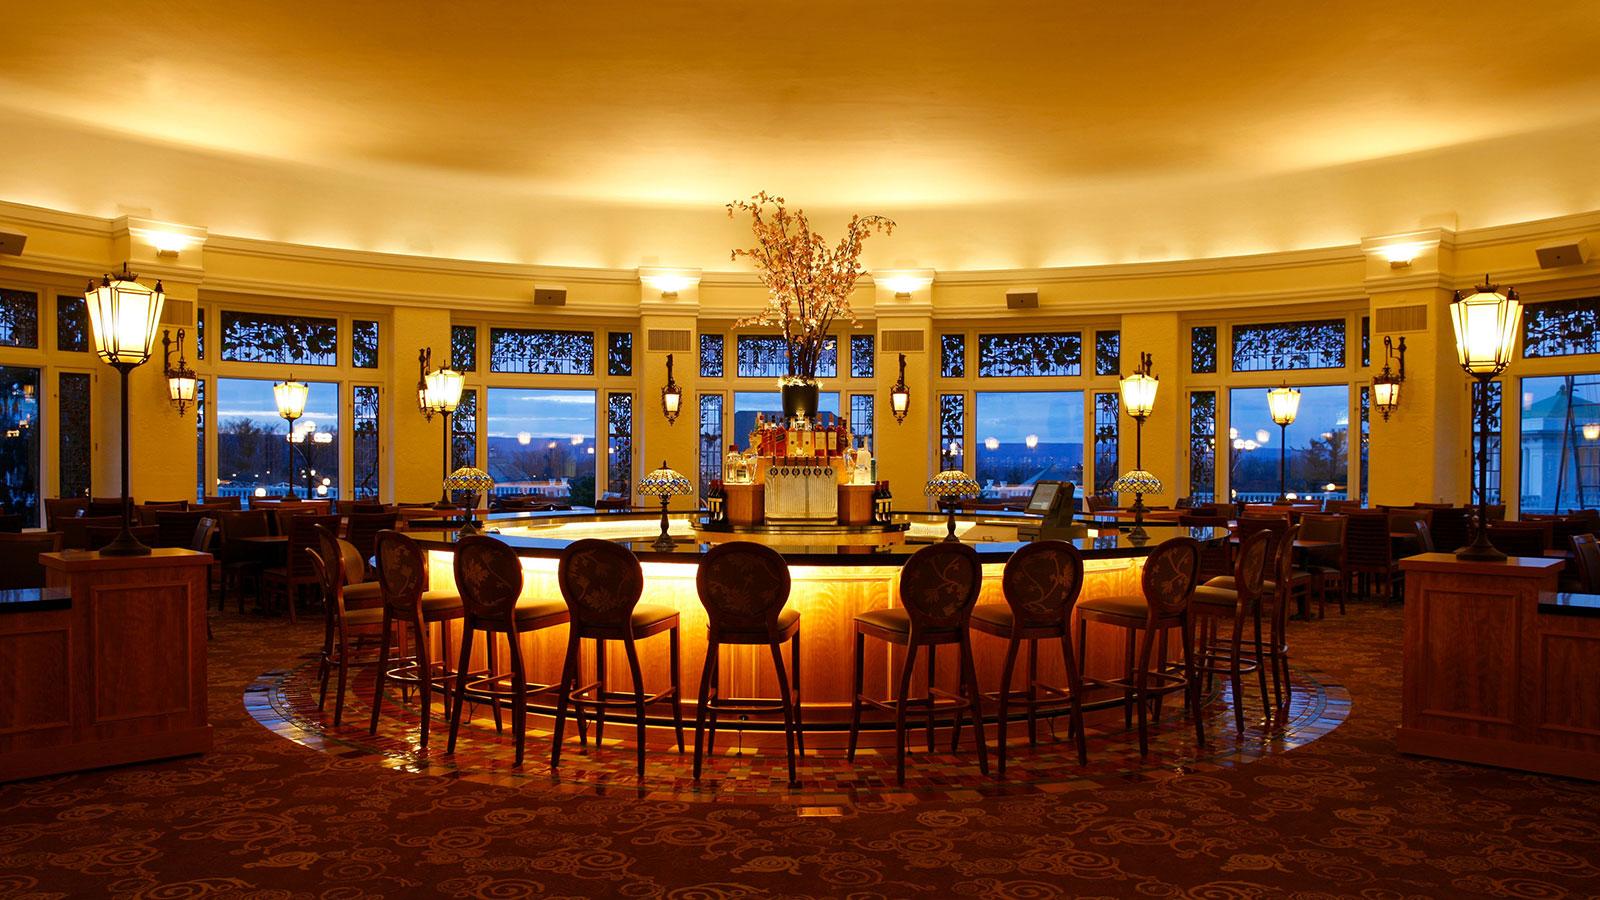 Image of The Circular Restaurant at The Hotel Hershey®, 1933, Member of Historic Hotels of America, in Hershey, Pennsylvania, Taste